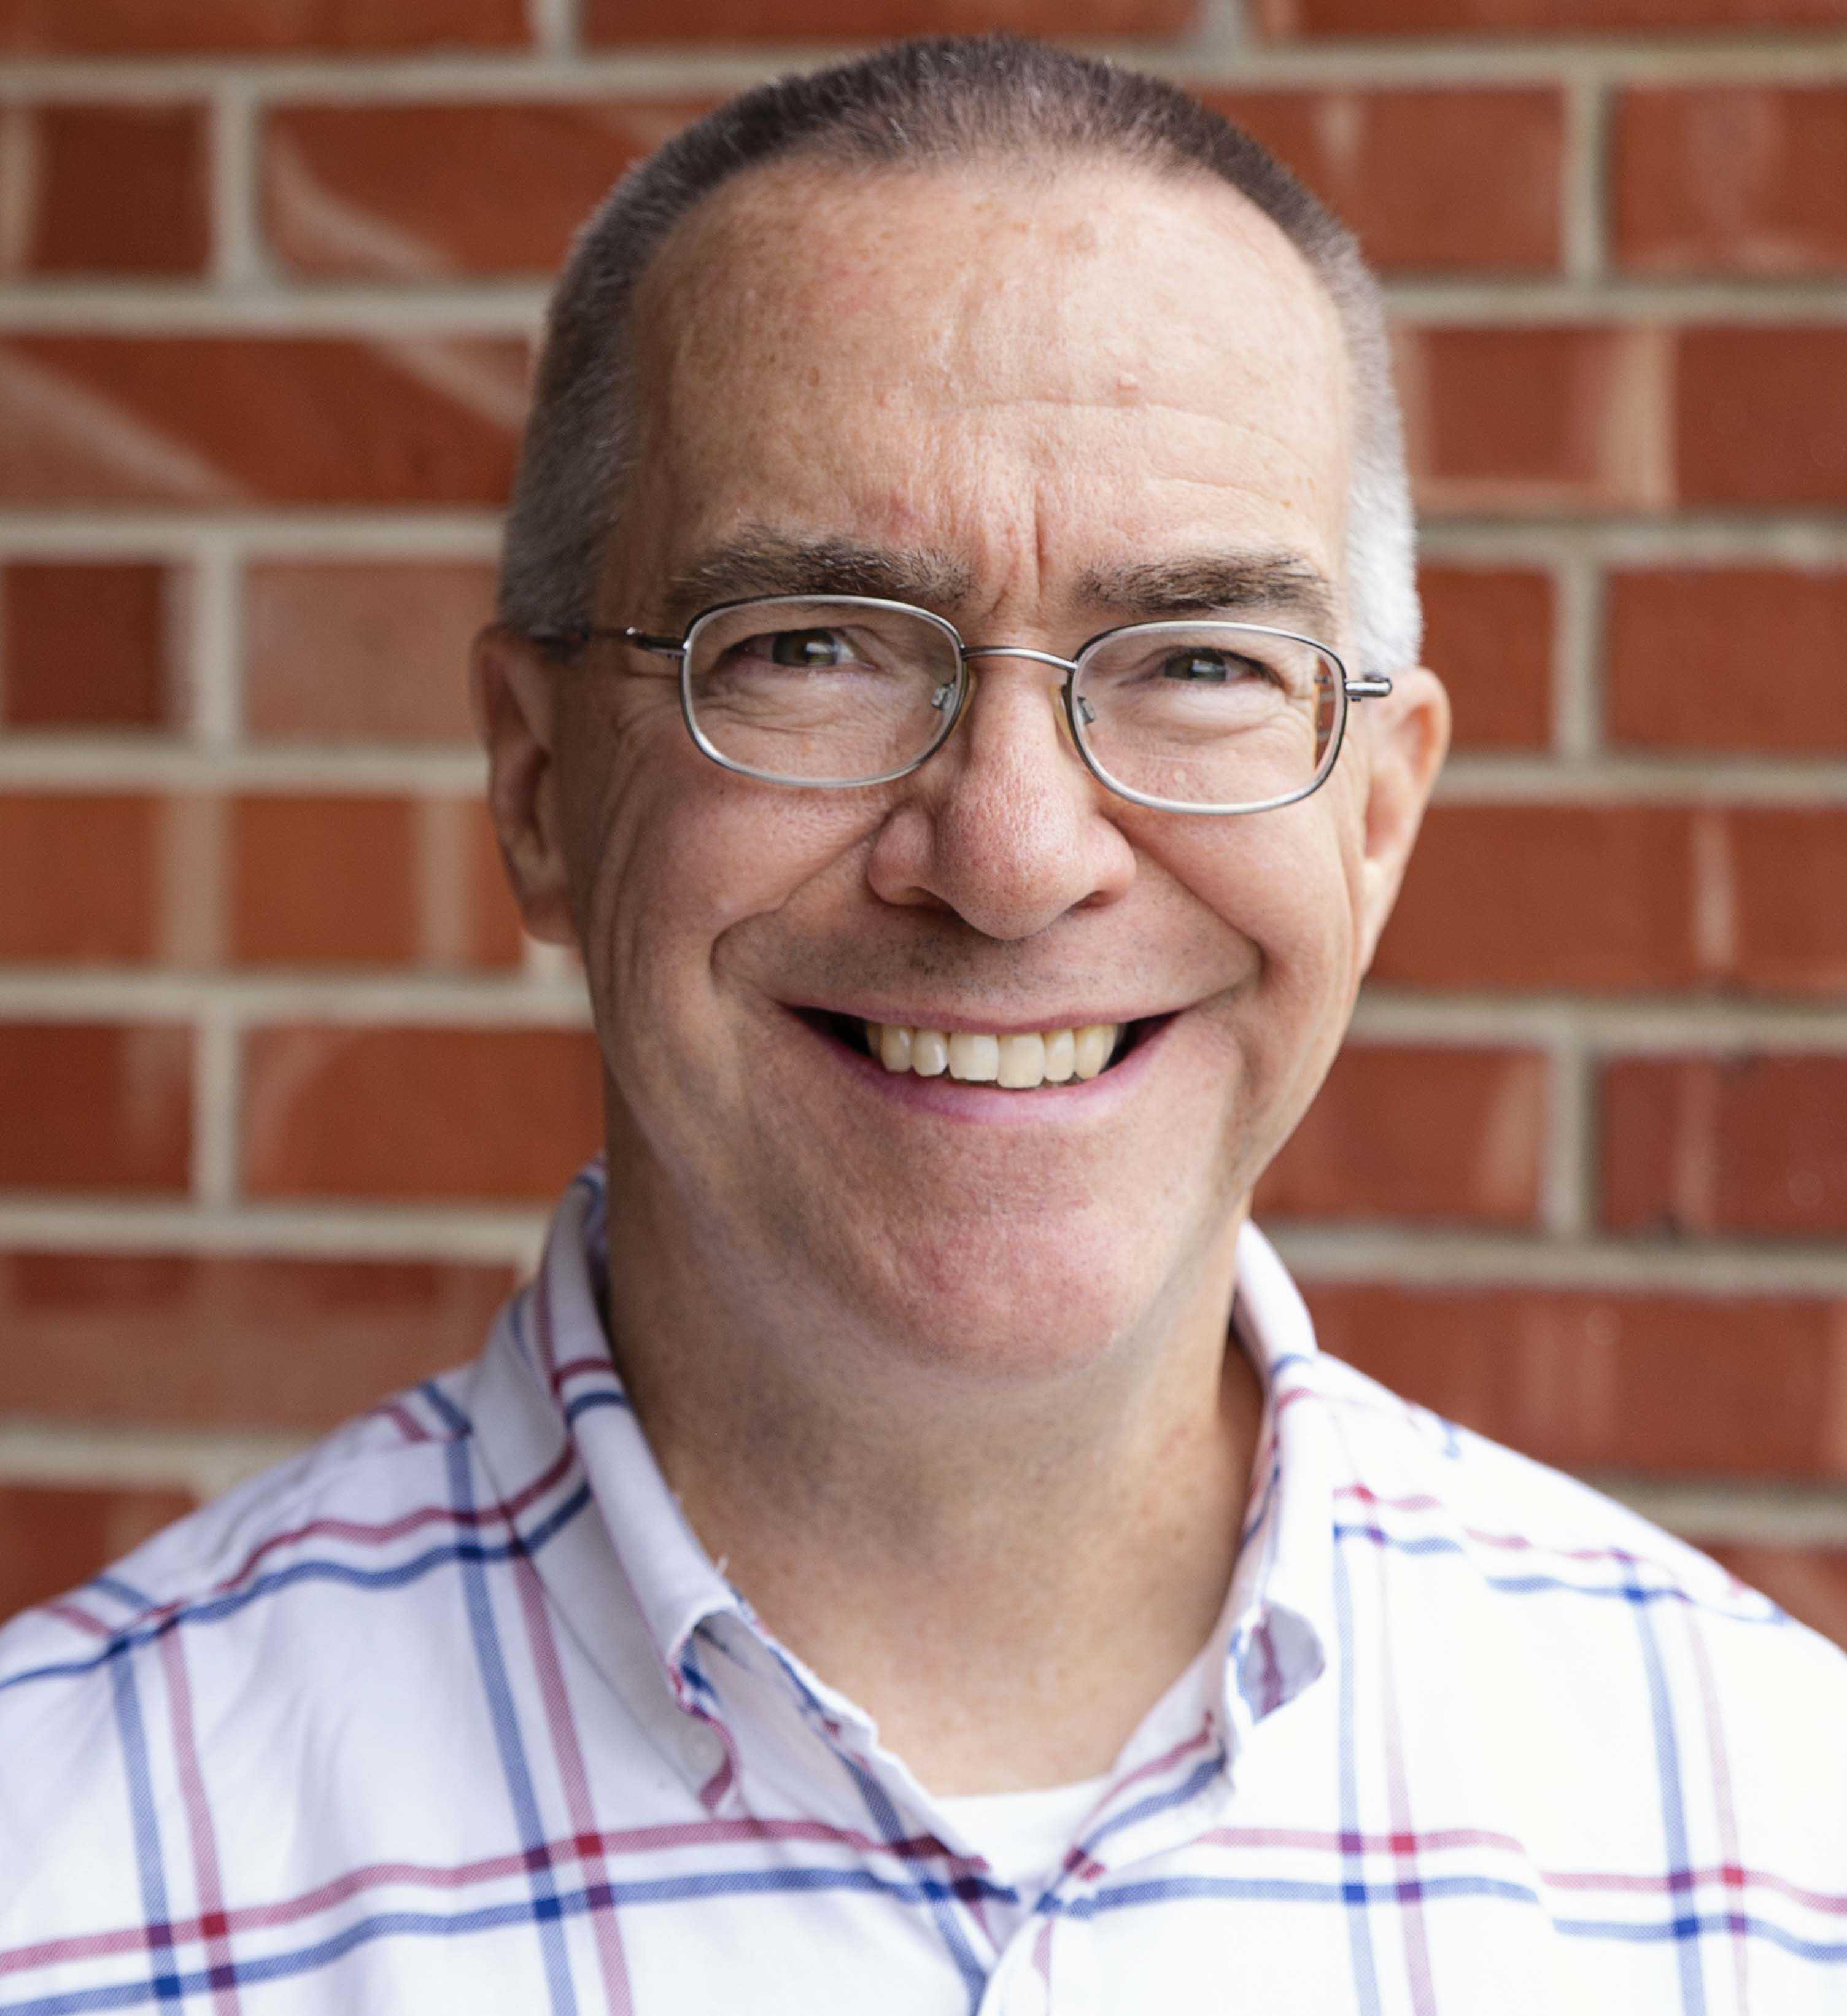 Steve Levon, Computer Science